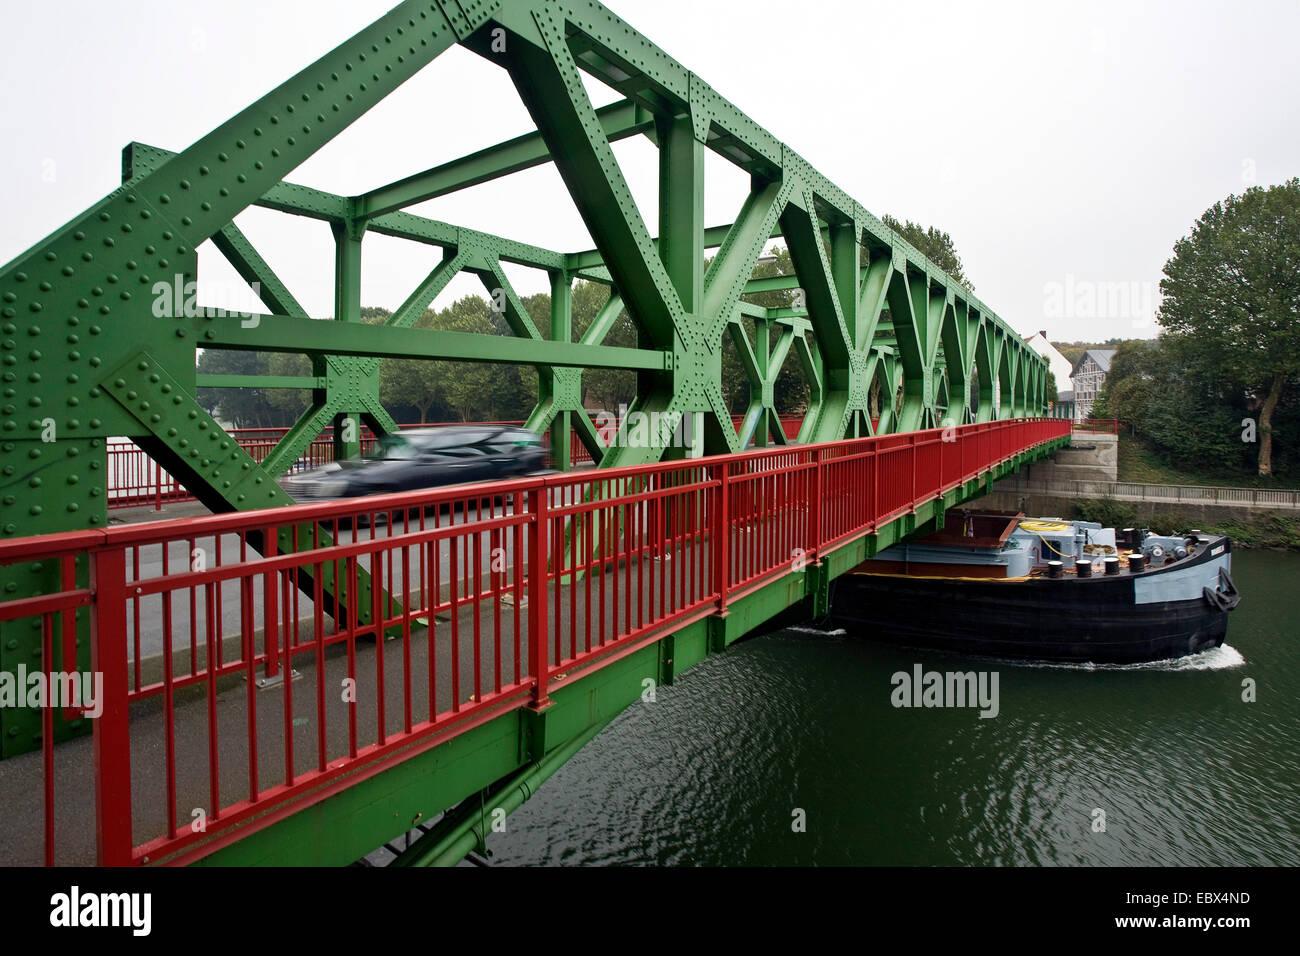 cargo ship on Dortmund Ems canal, a car passing the Lucas bridge, Germany, North Rhine-Westphalia, Ruhr Area, Datteln - Stock Image